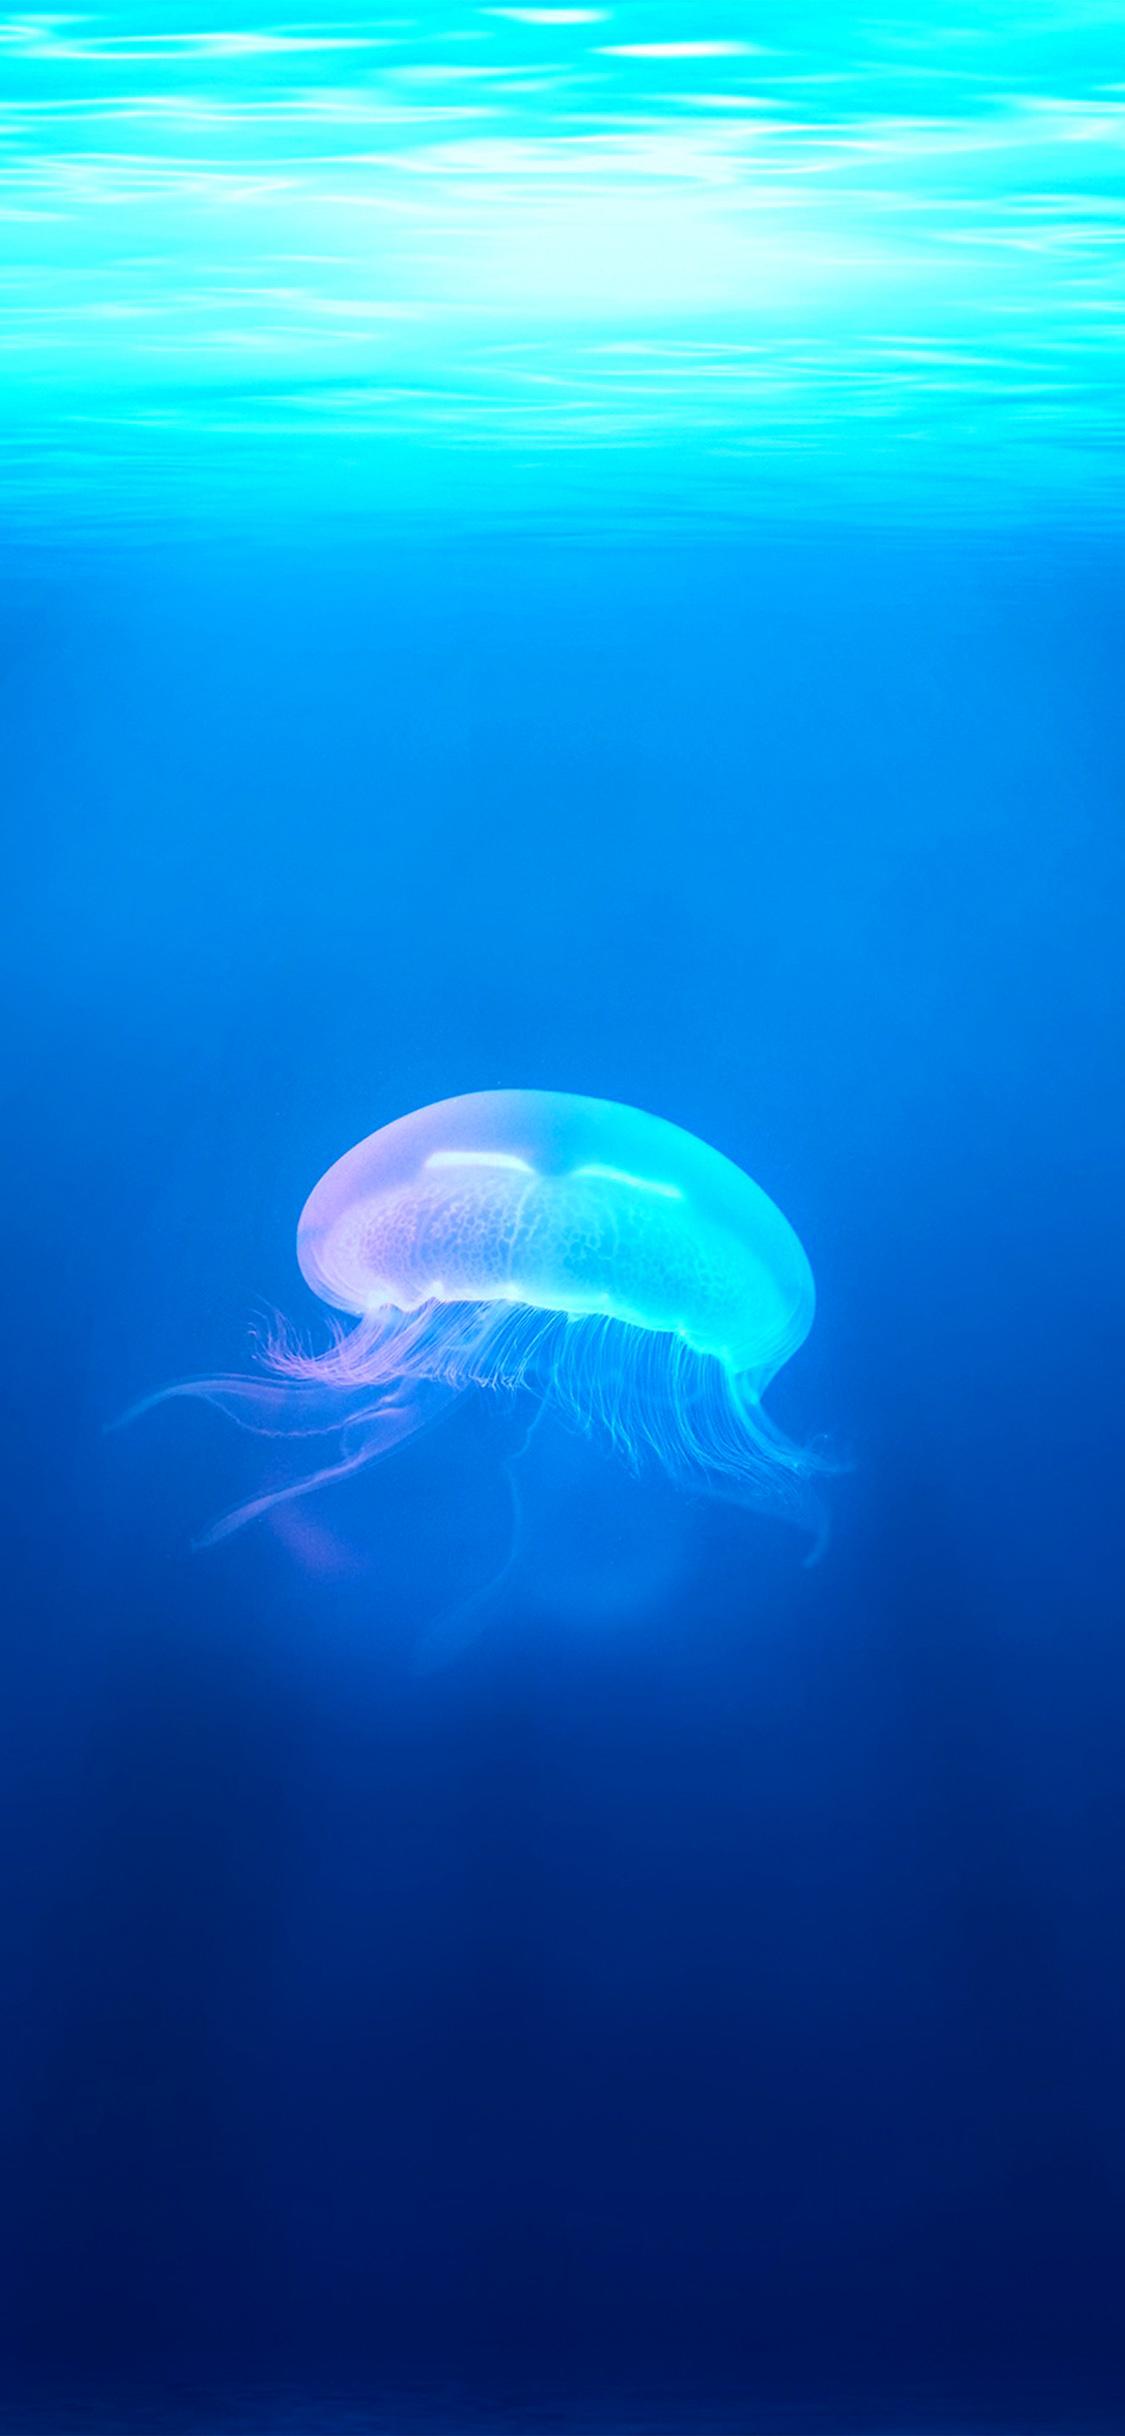 Iphonexpapers Com Iphone X Wallpaper Na45 Jellyfish Sea Ocean Water Blue Animal